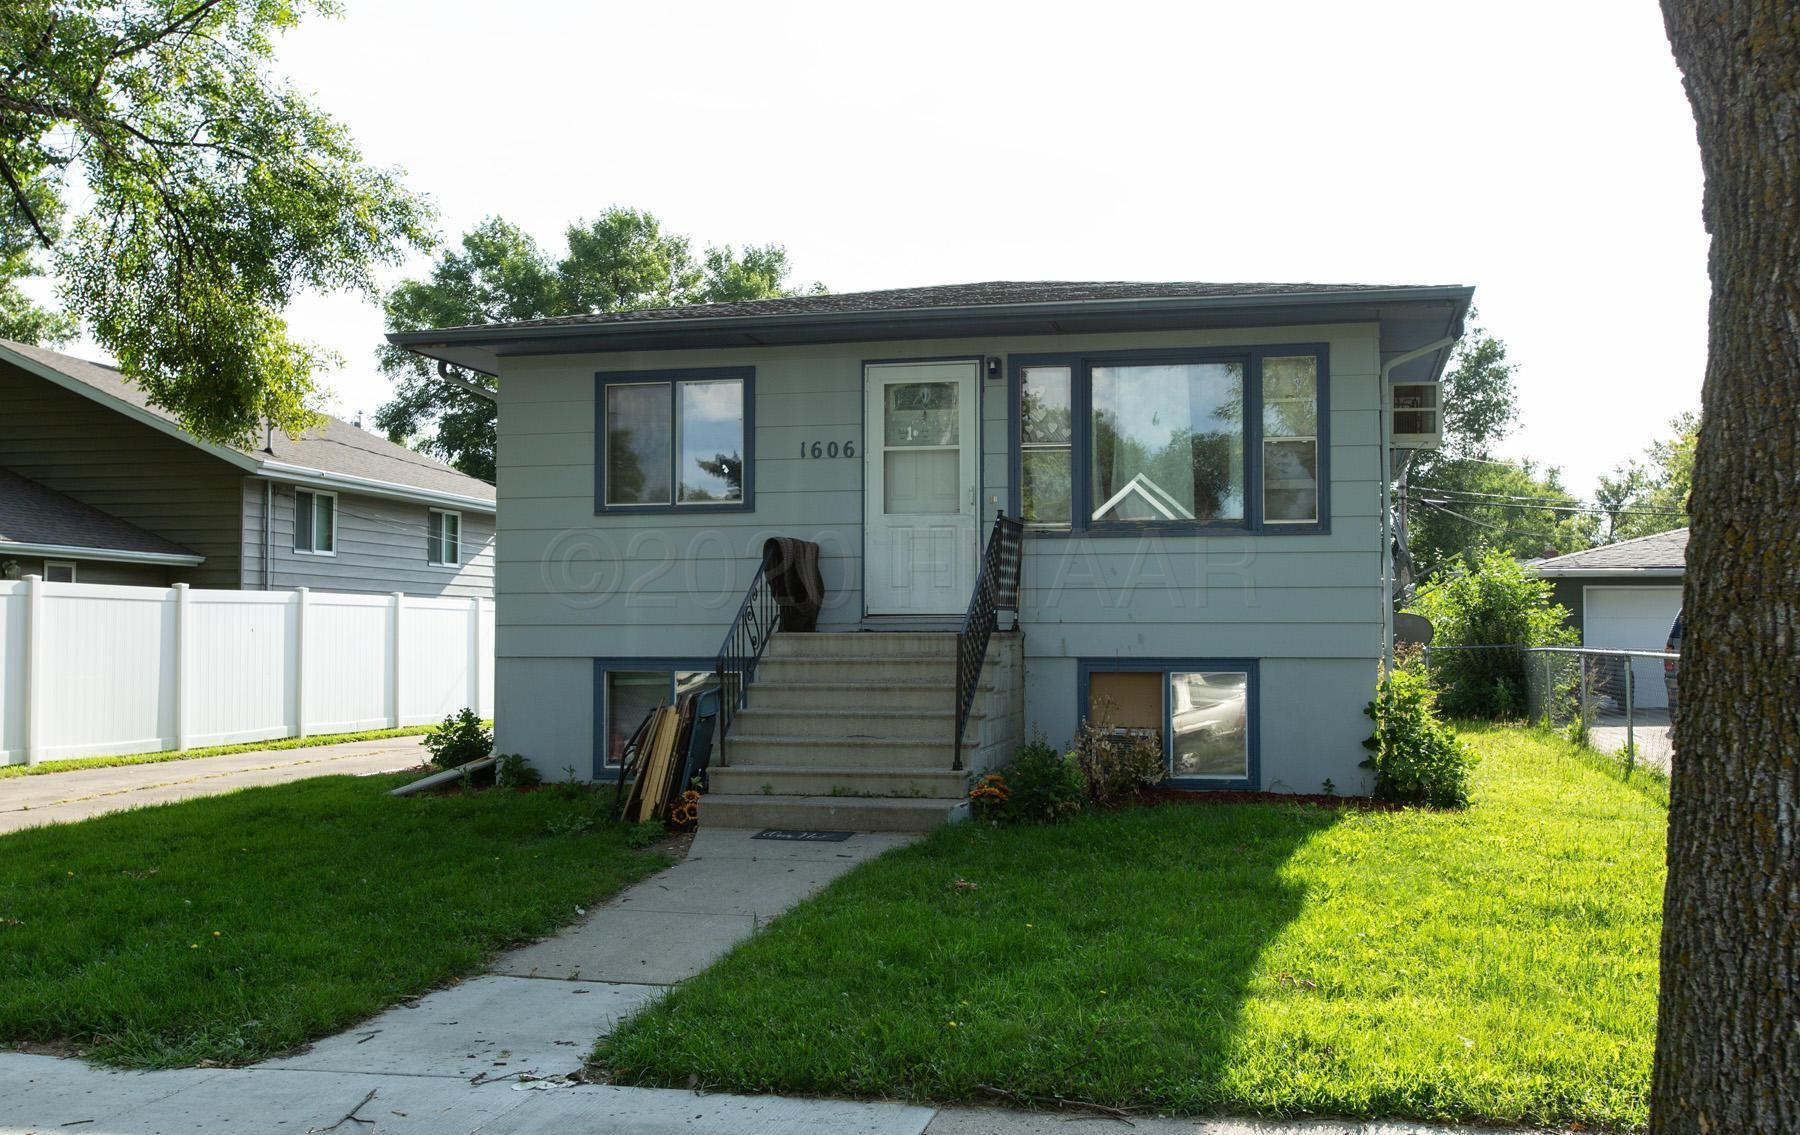 1606 16 Street S, Fargo, ND 58103 - #: 20-4974